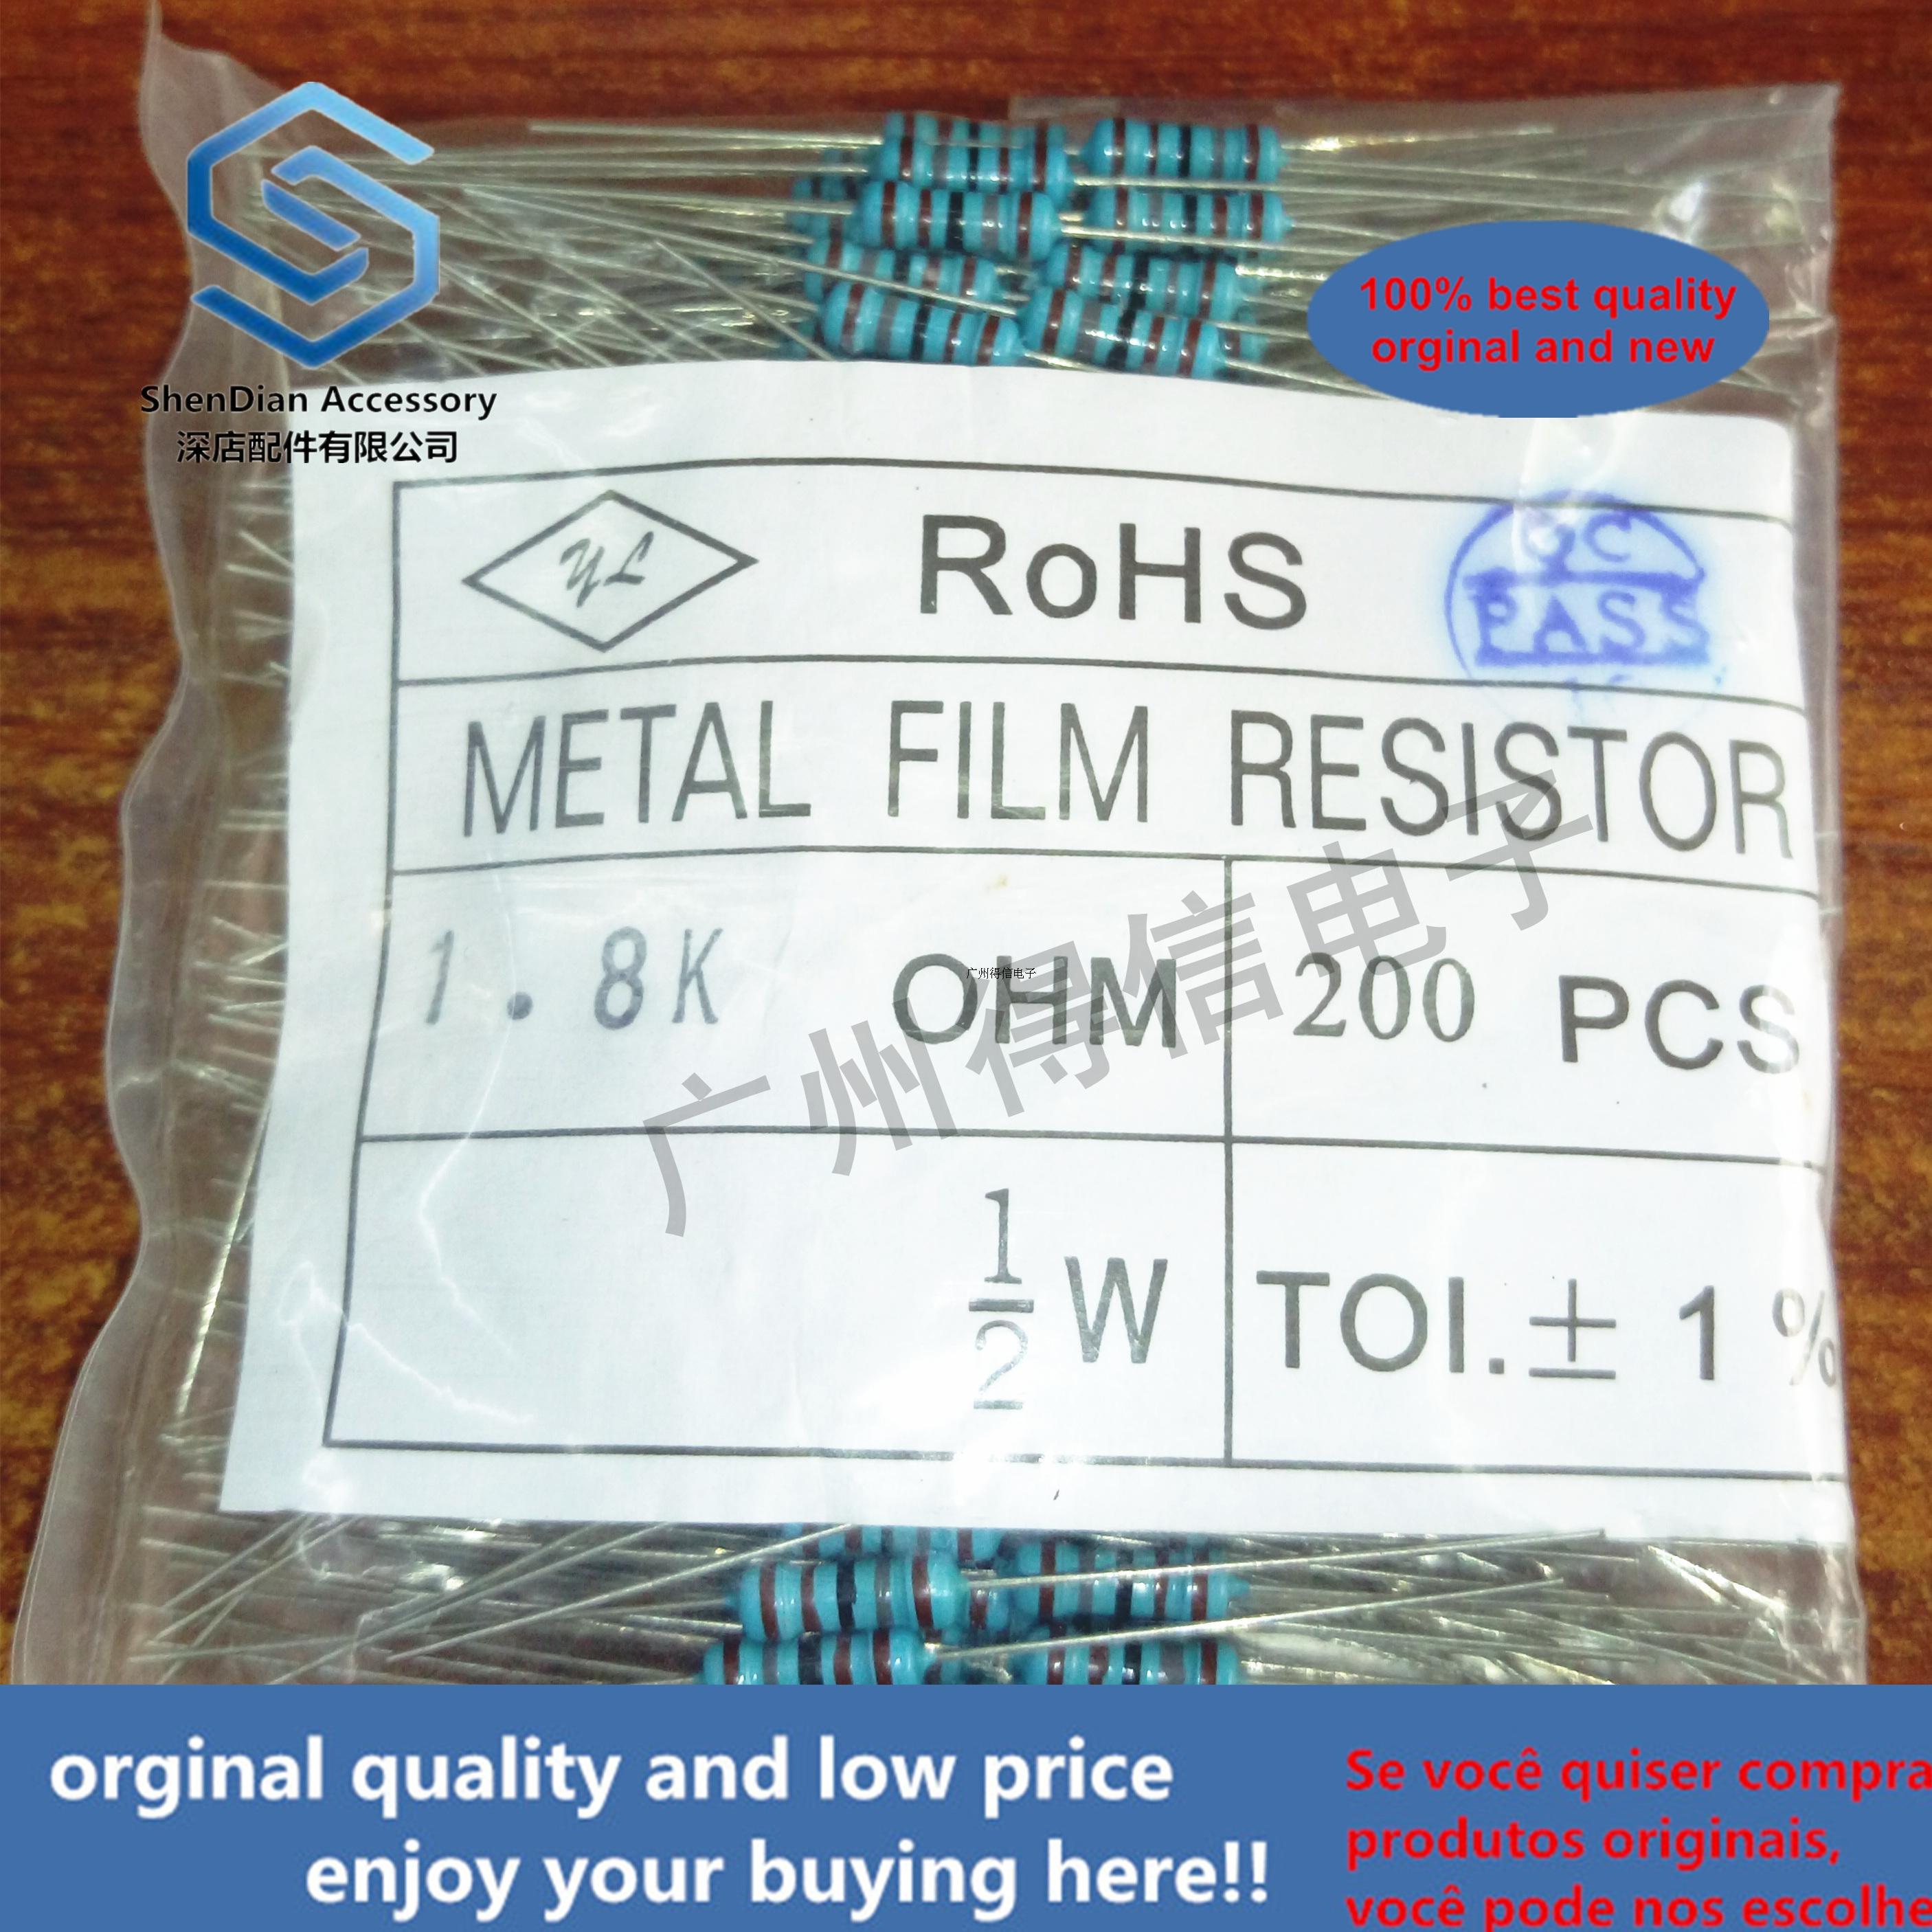 200pcs 1 / 2W 750K 1% Brand New Metal Film Iron Feet Resistor Bag 200 Pcs Per Pack